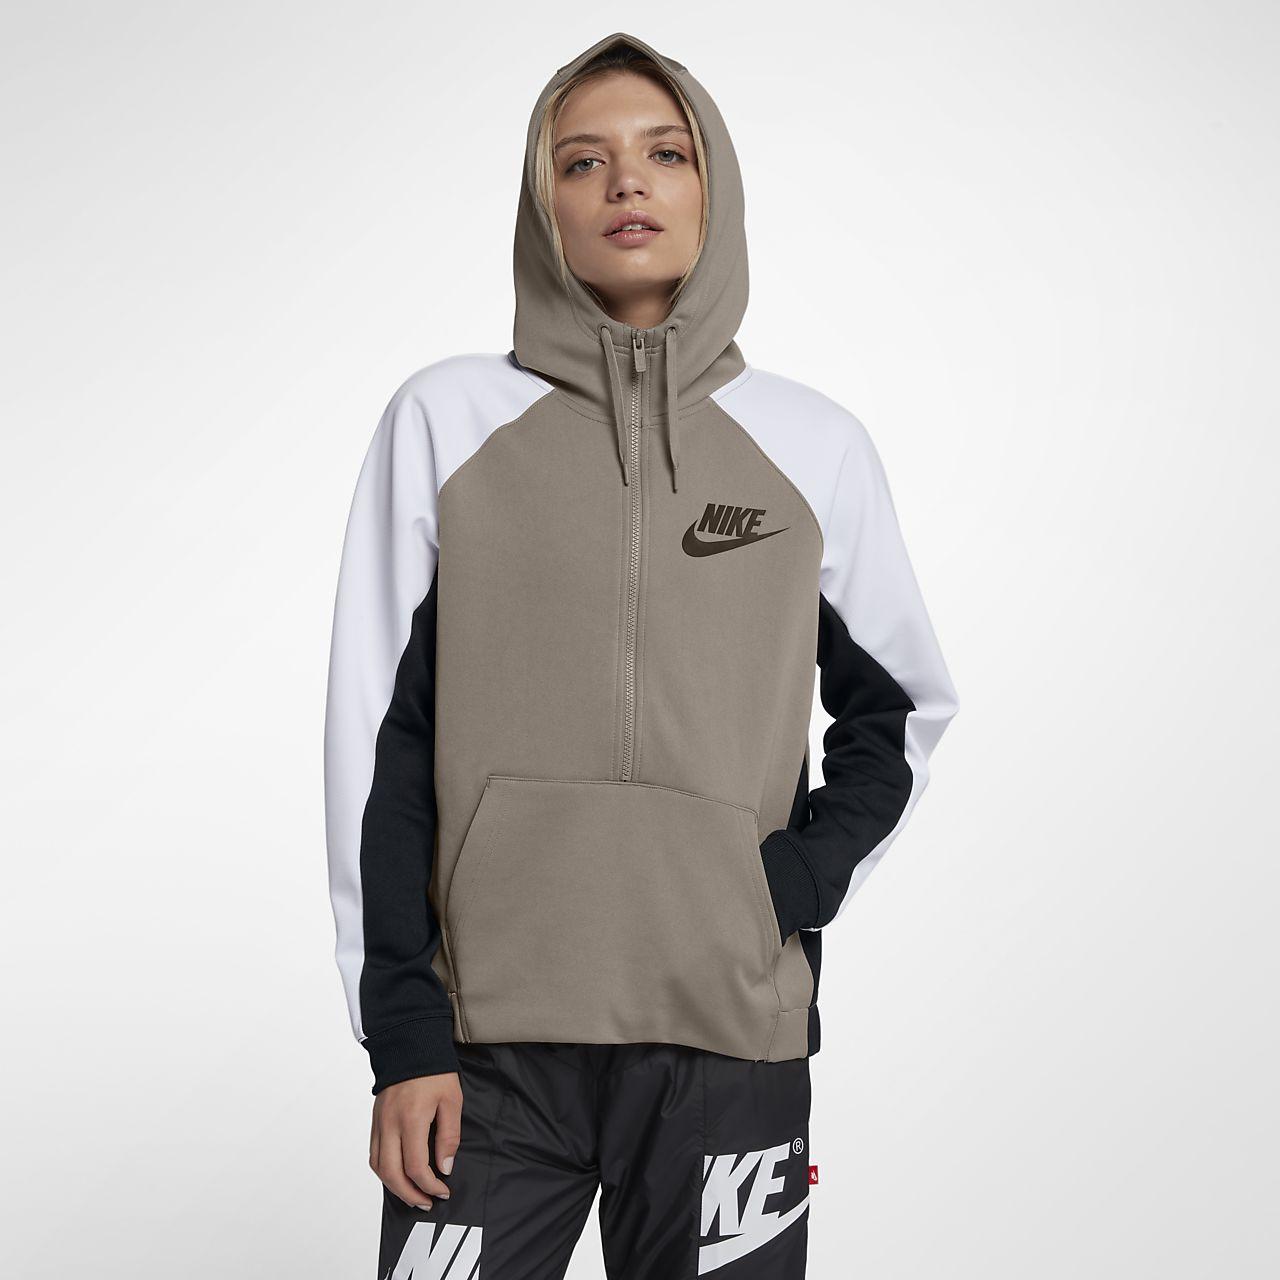 ... Sweat à capuche demi-zippé Nike Sportswear pour Femme